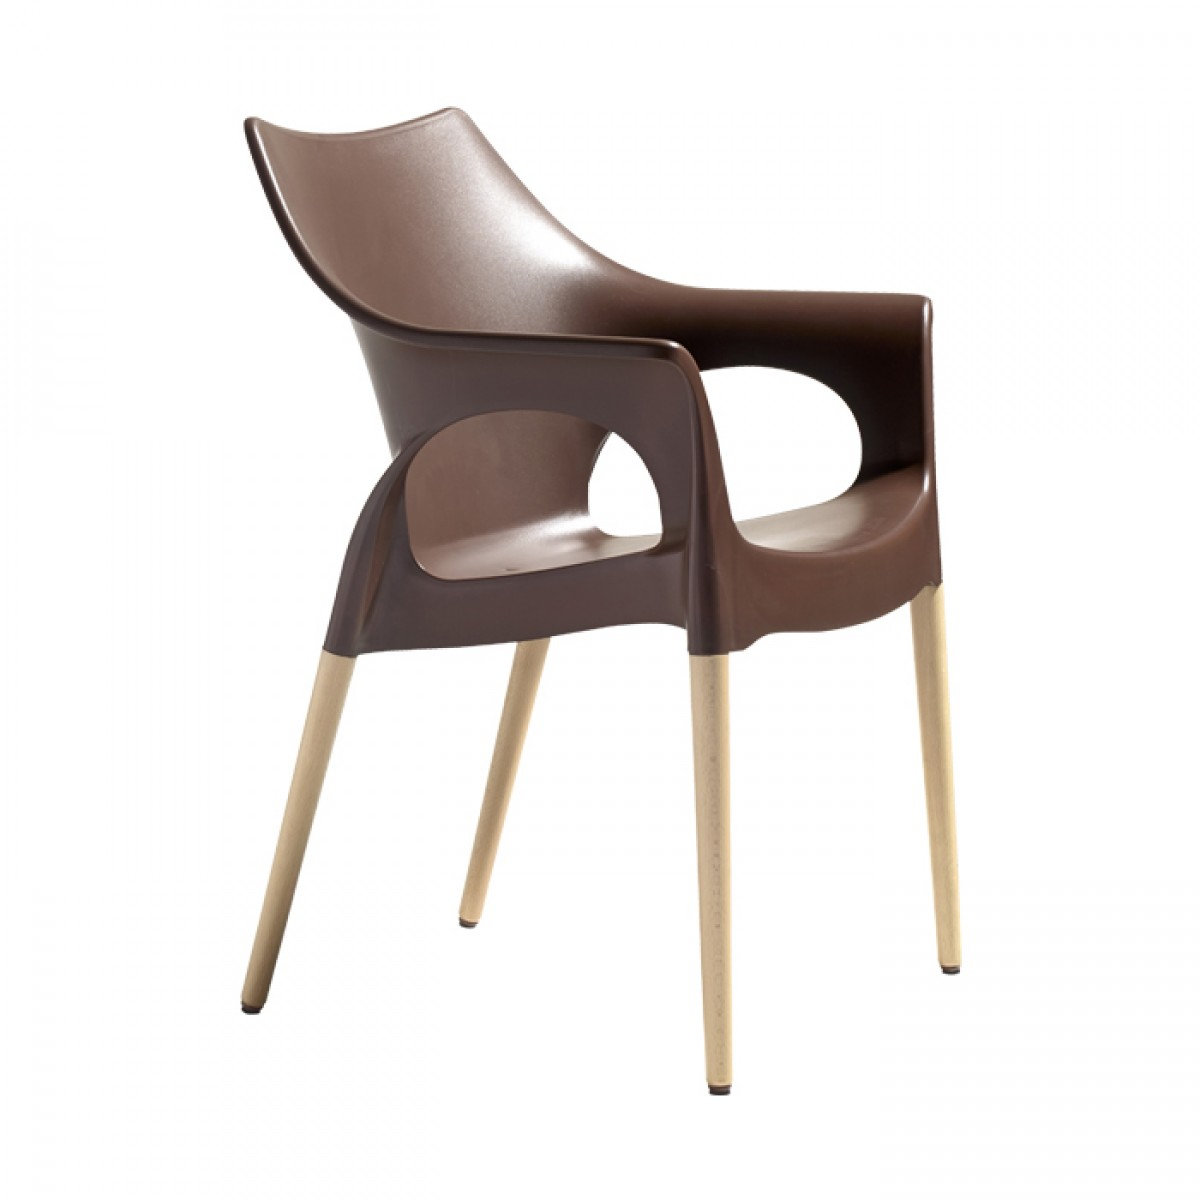 brązowe krzesło do jadalni Natural Ola Scab Design